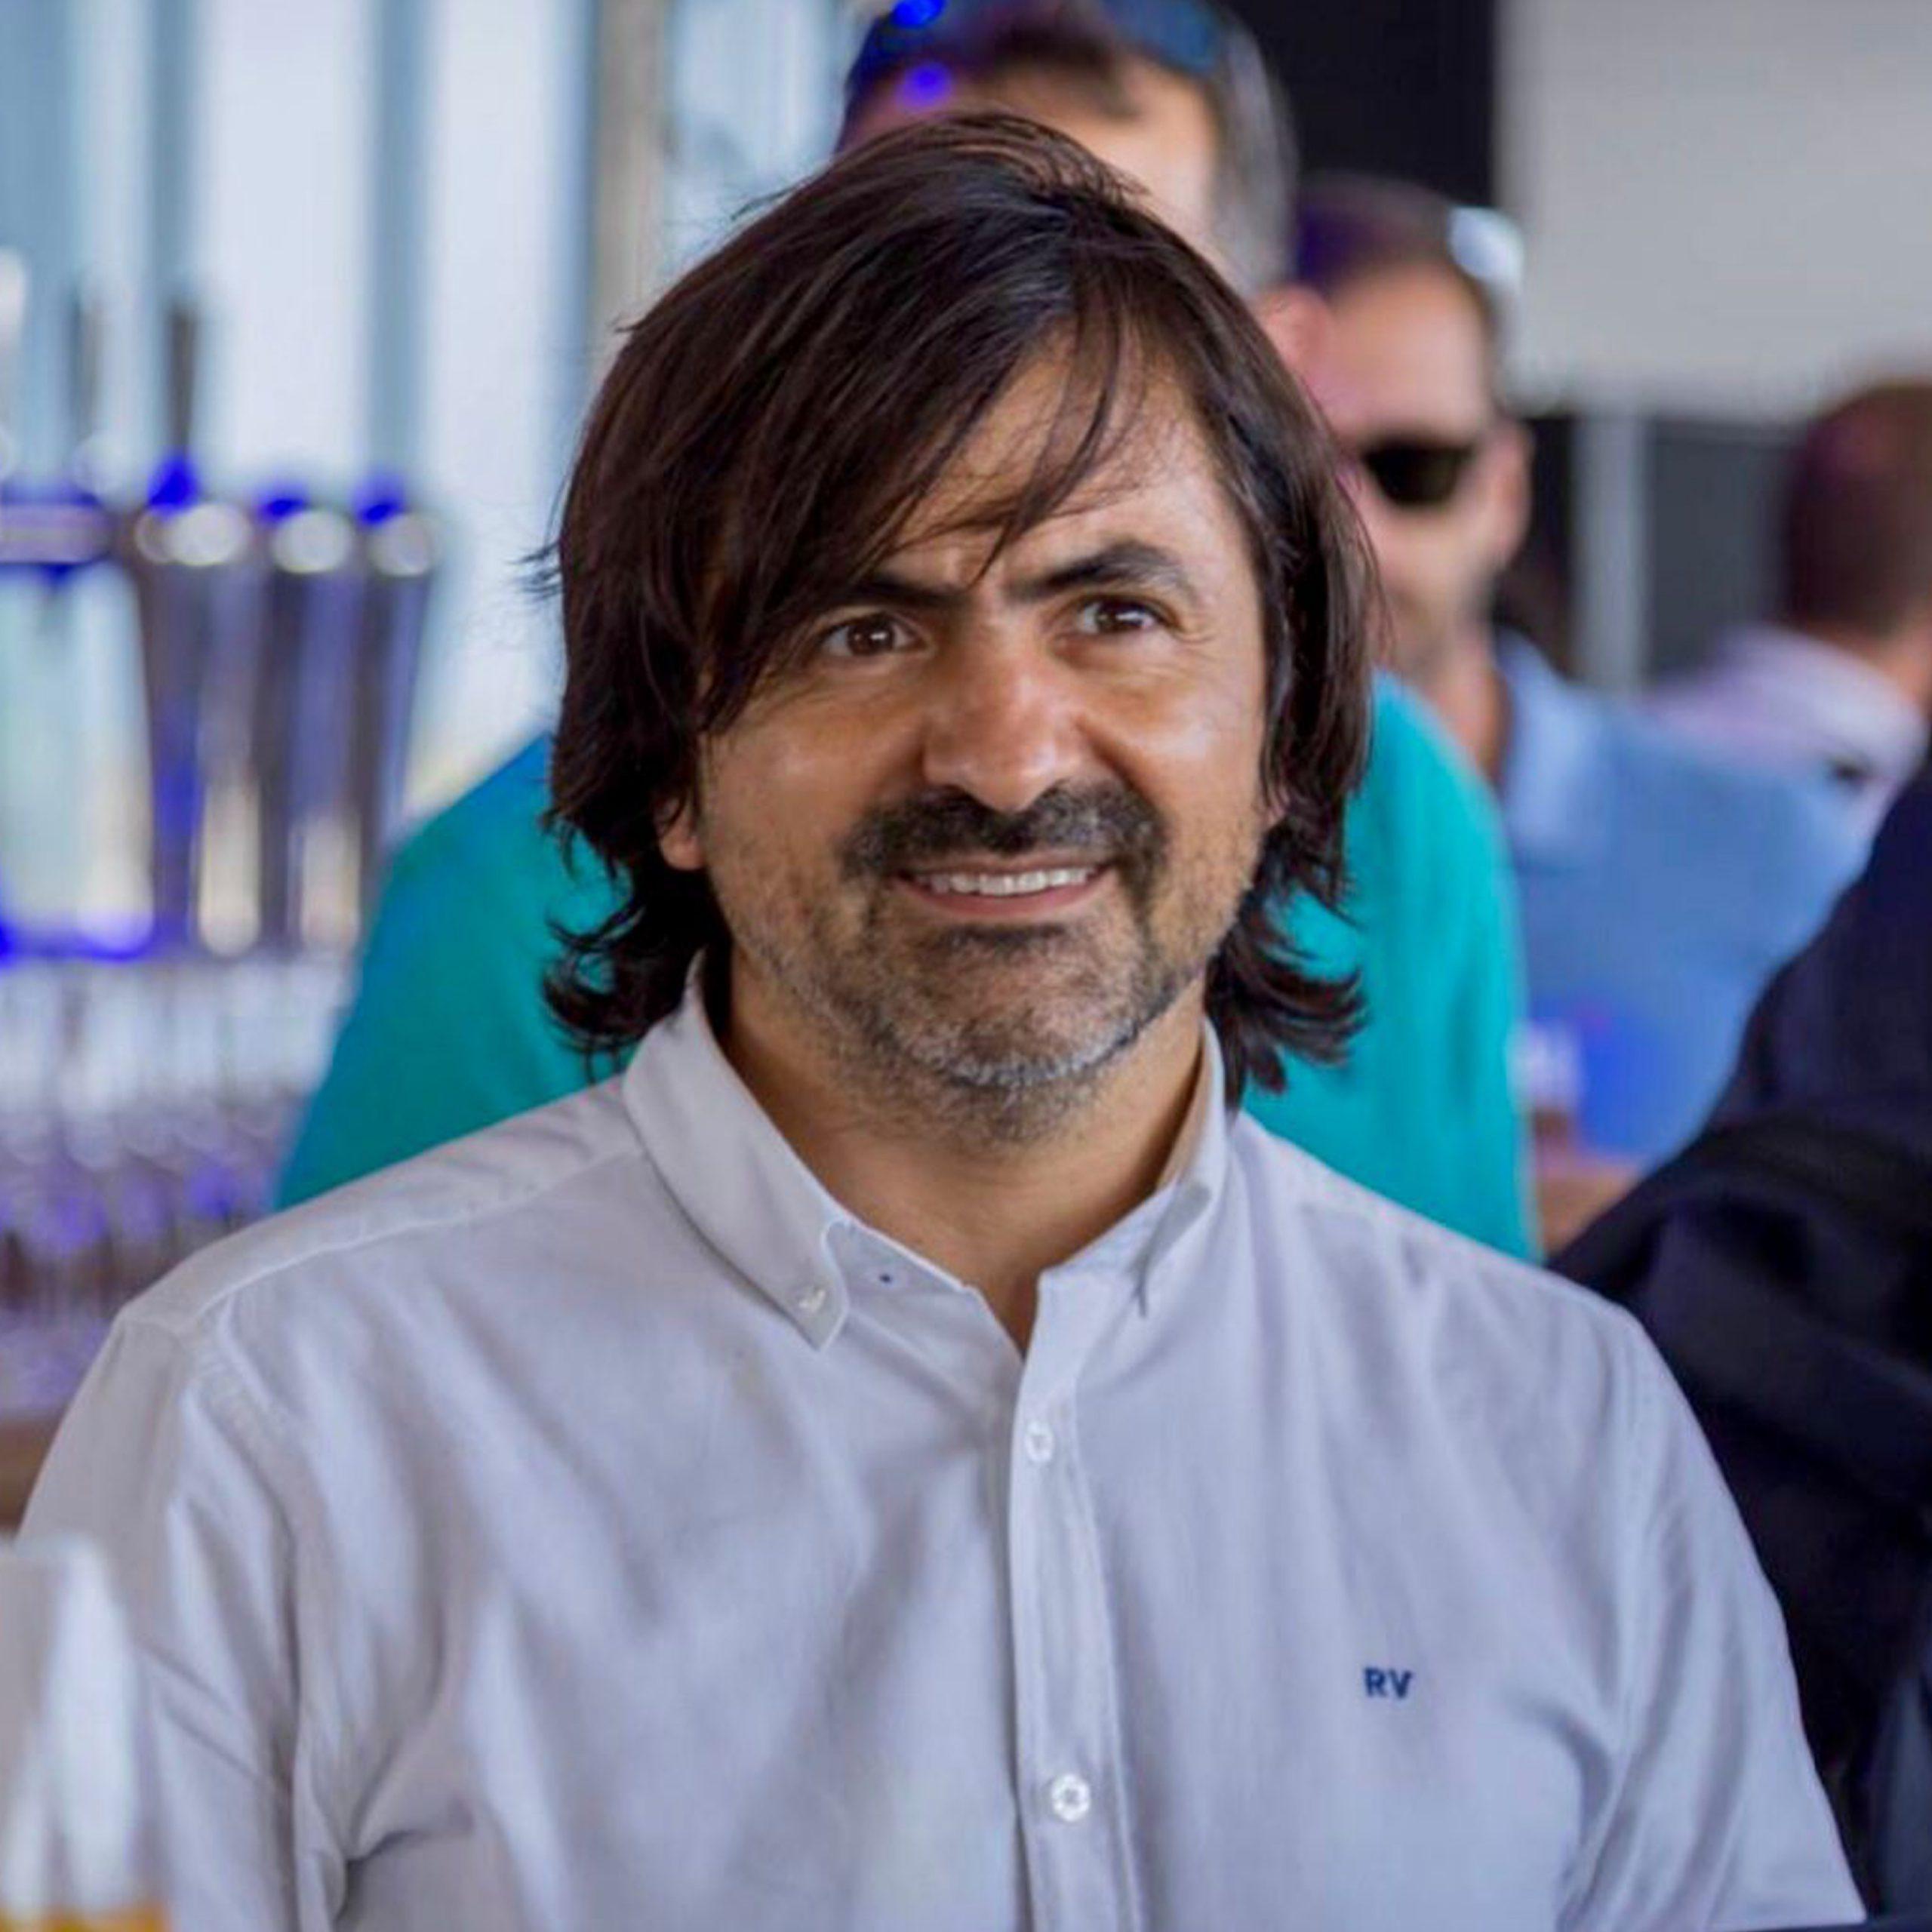 09_Dr. David de Vicente